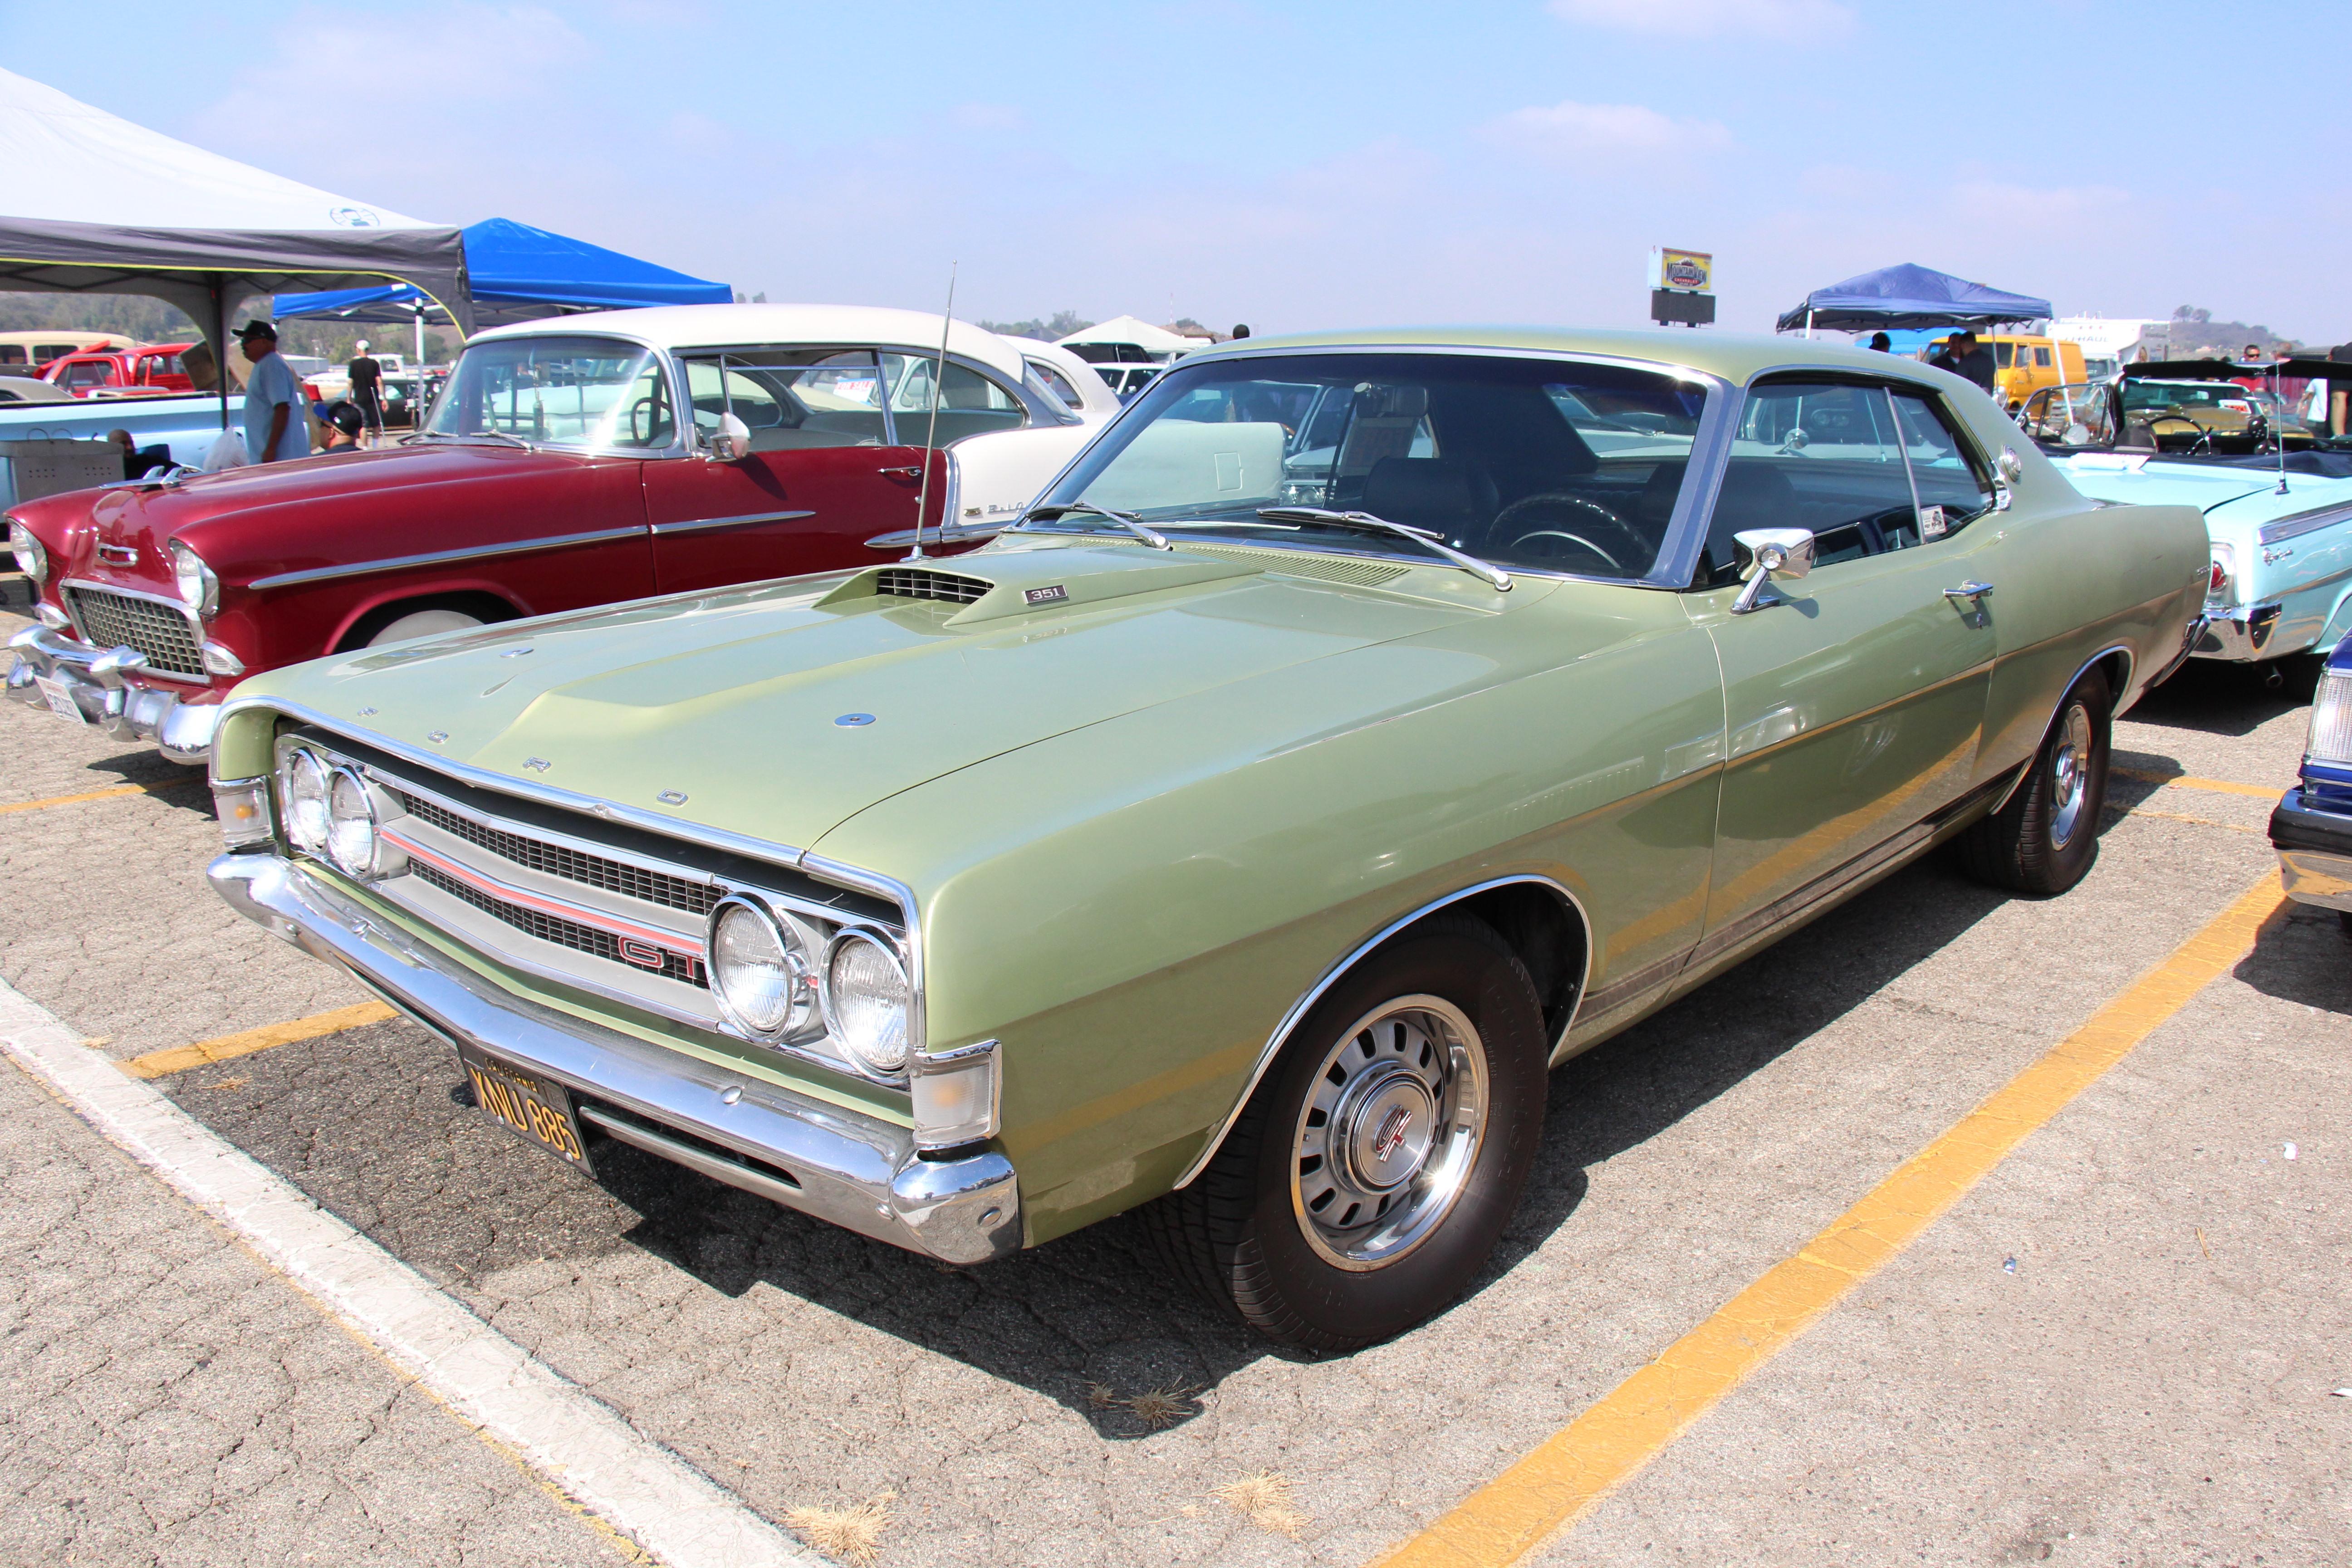 File:1969 Ford Torino GT Hardtop (21085381171) jpg